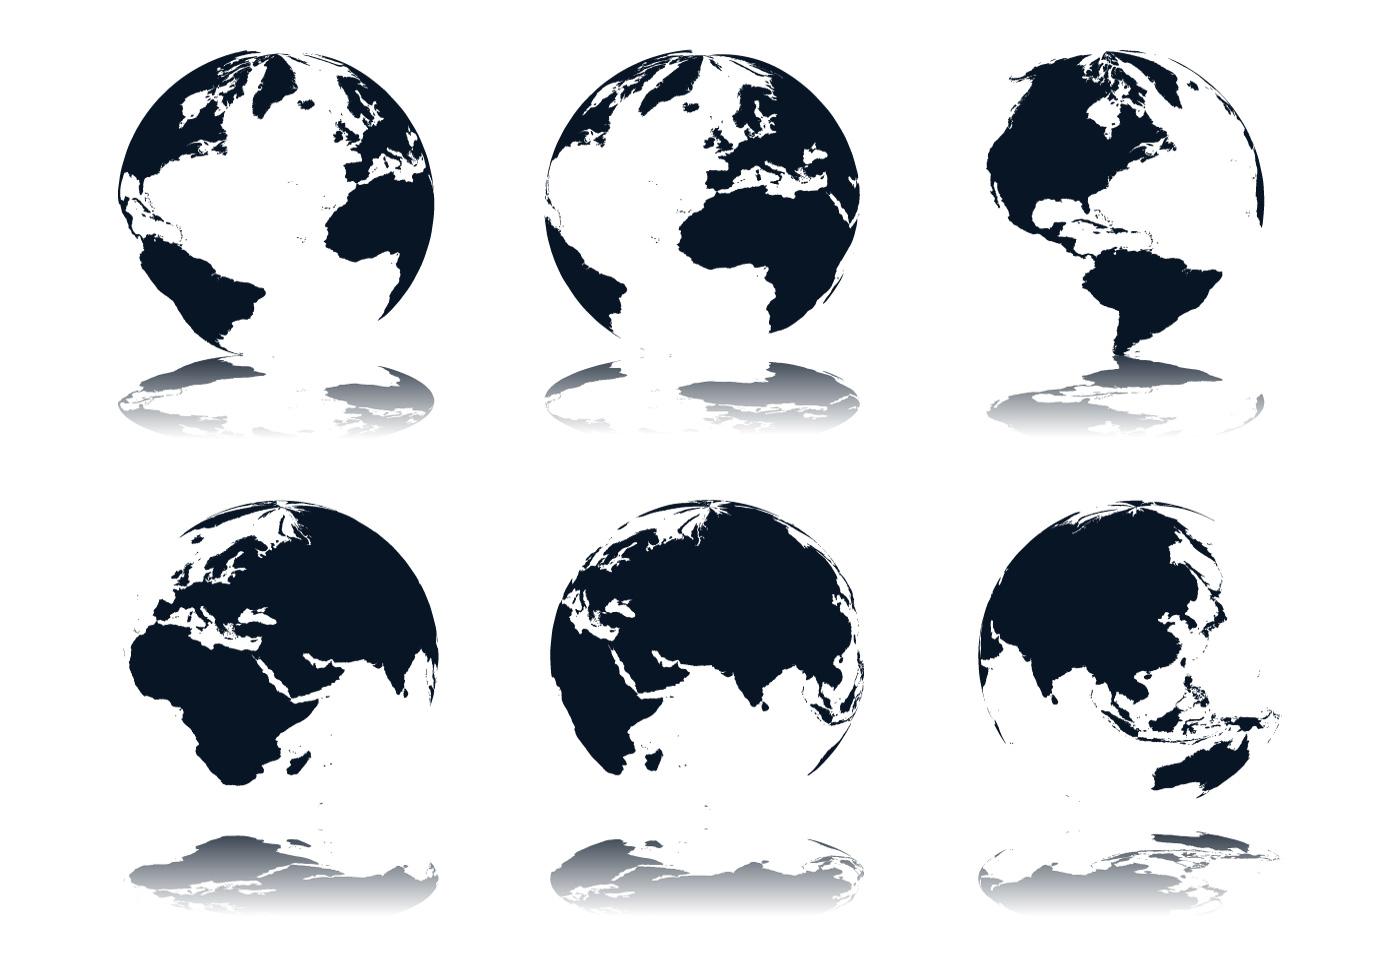 Globe Icon Vectors - Download Free Vectors, Clipart ...